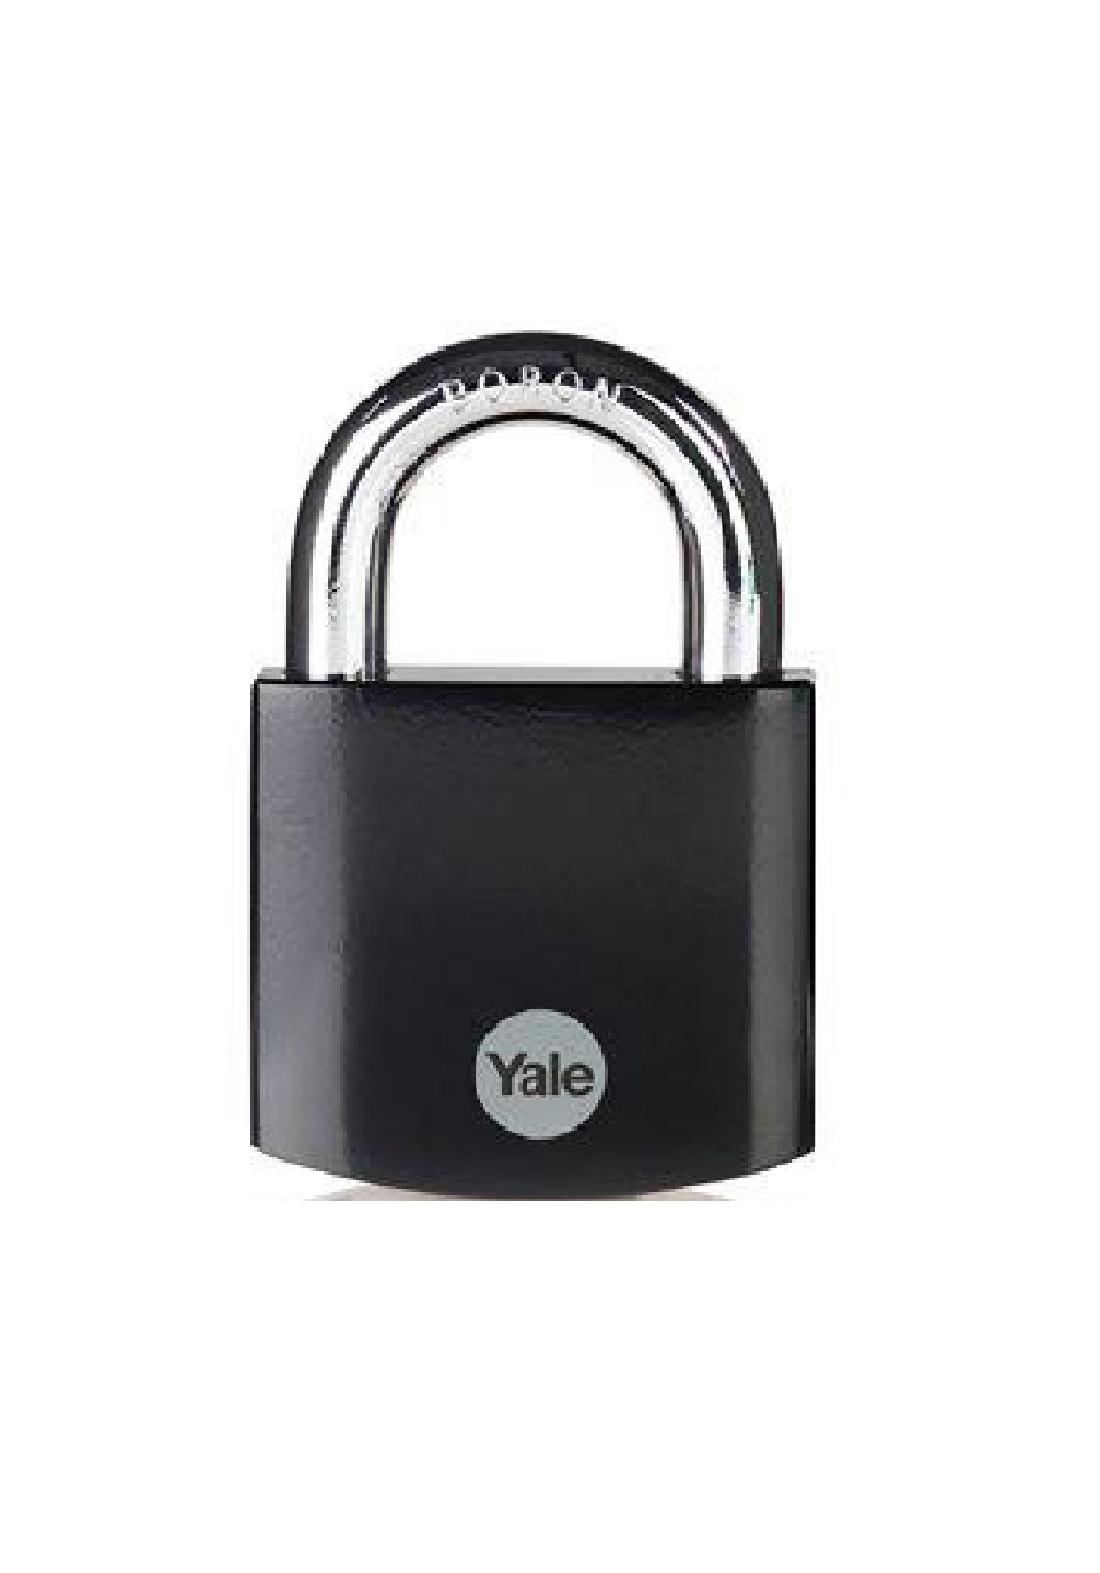 Yale Y300B/63/127/1 Padlock Brass 63 mm قفل للاغراض العامة